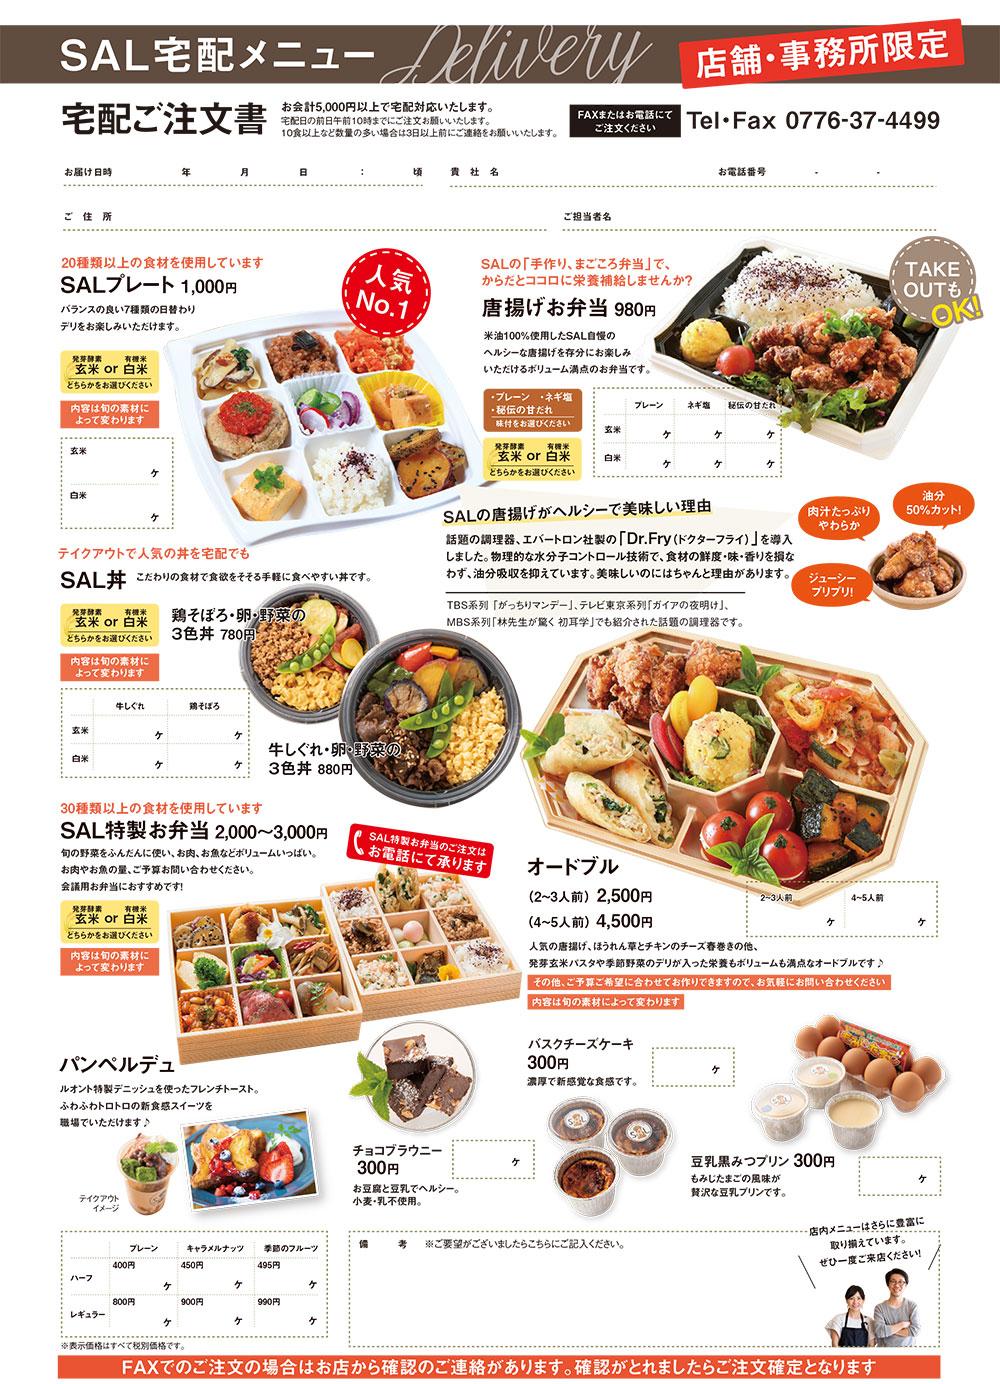 natural kitchen sal デリバリー 宅配メニュー